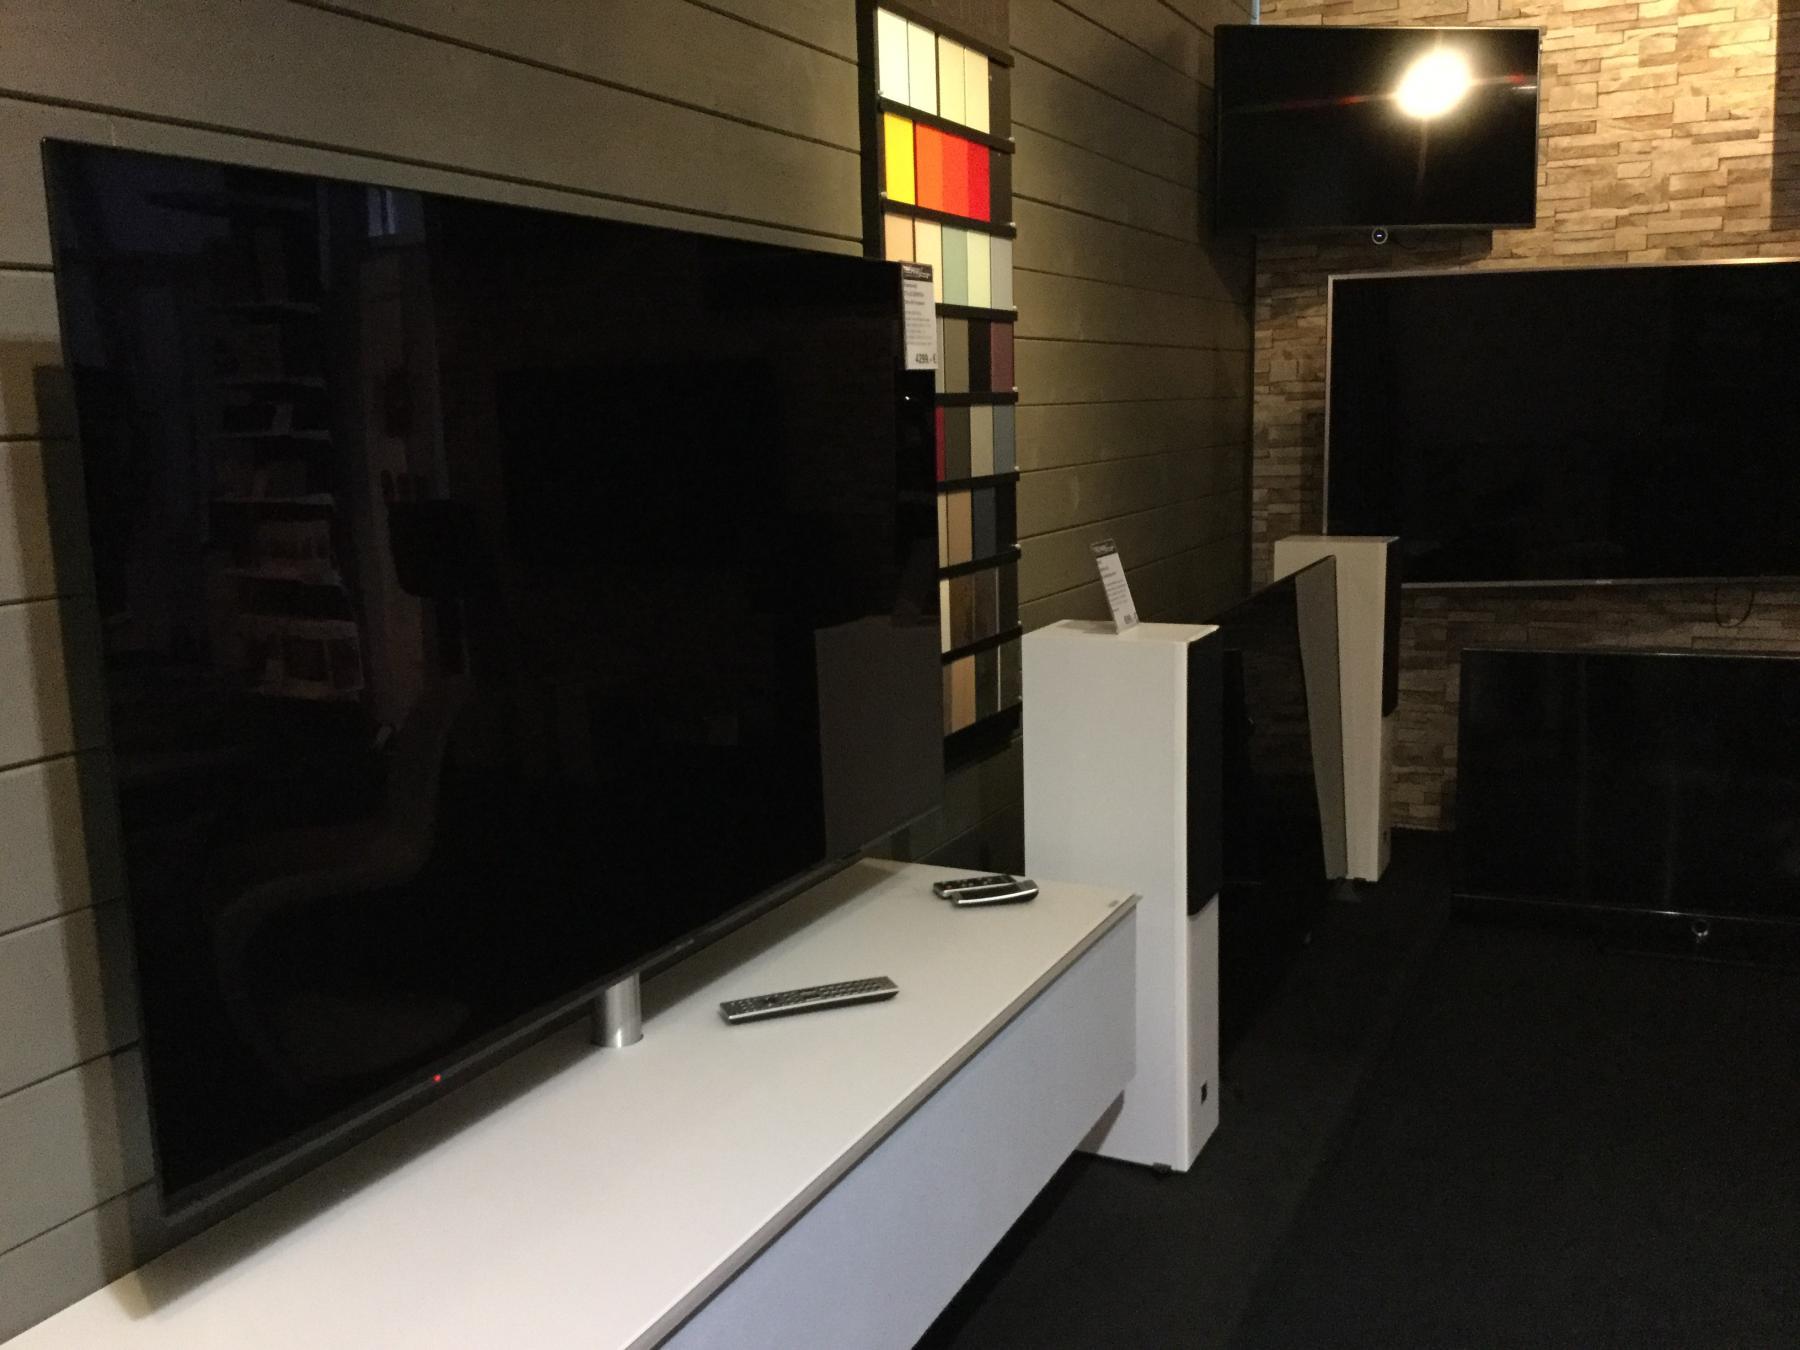 sonos one w lan lautsprecher bei technik lounge. Black Bedroom Furniture Sets. Home Design Ideas